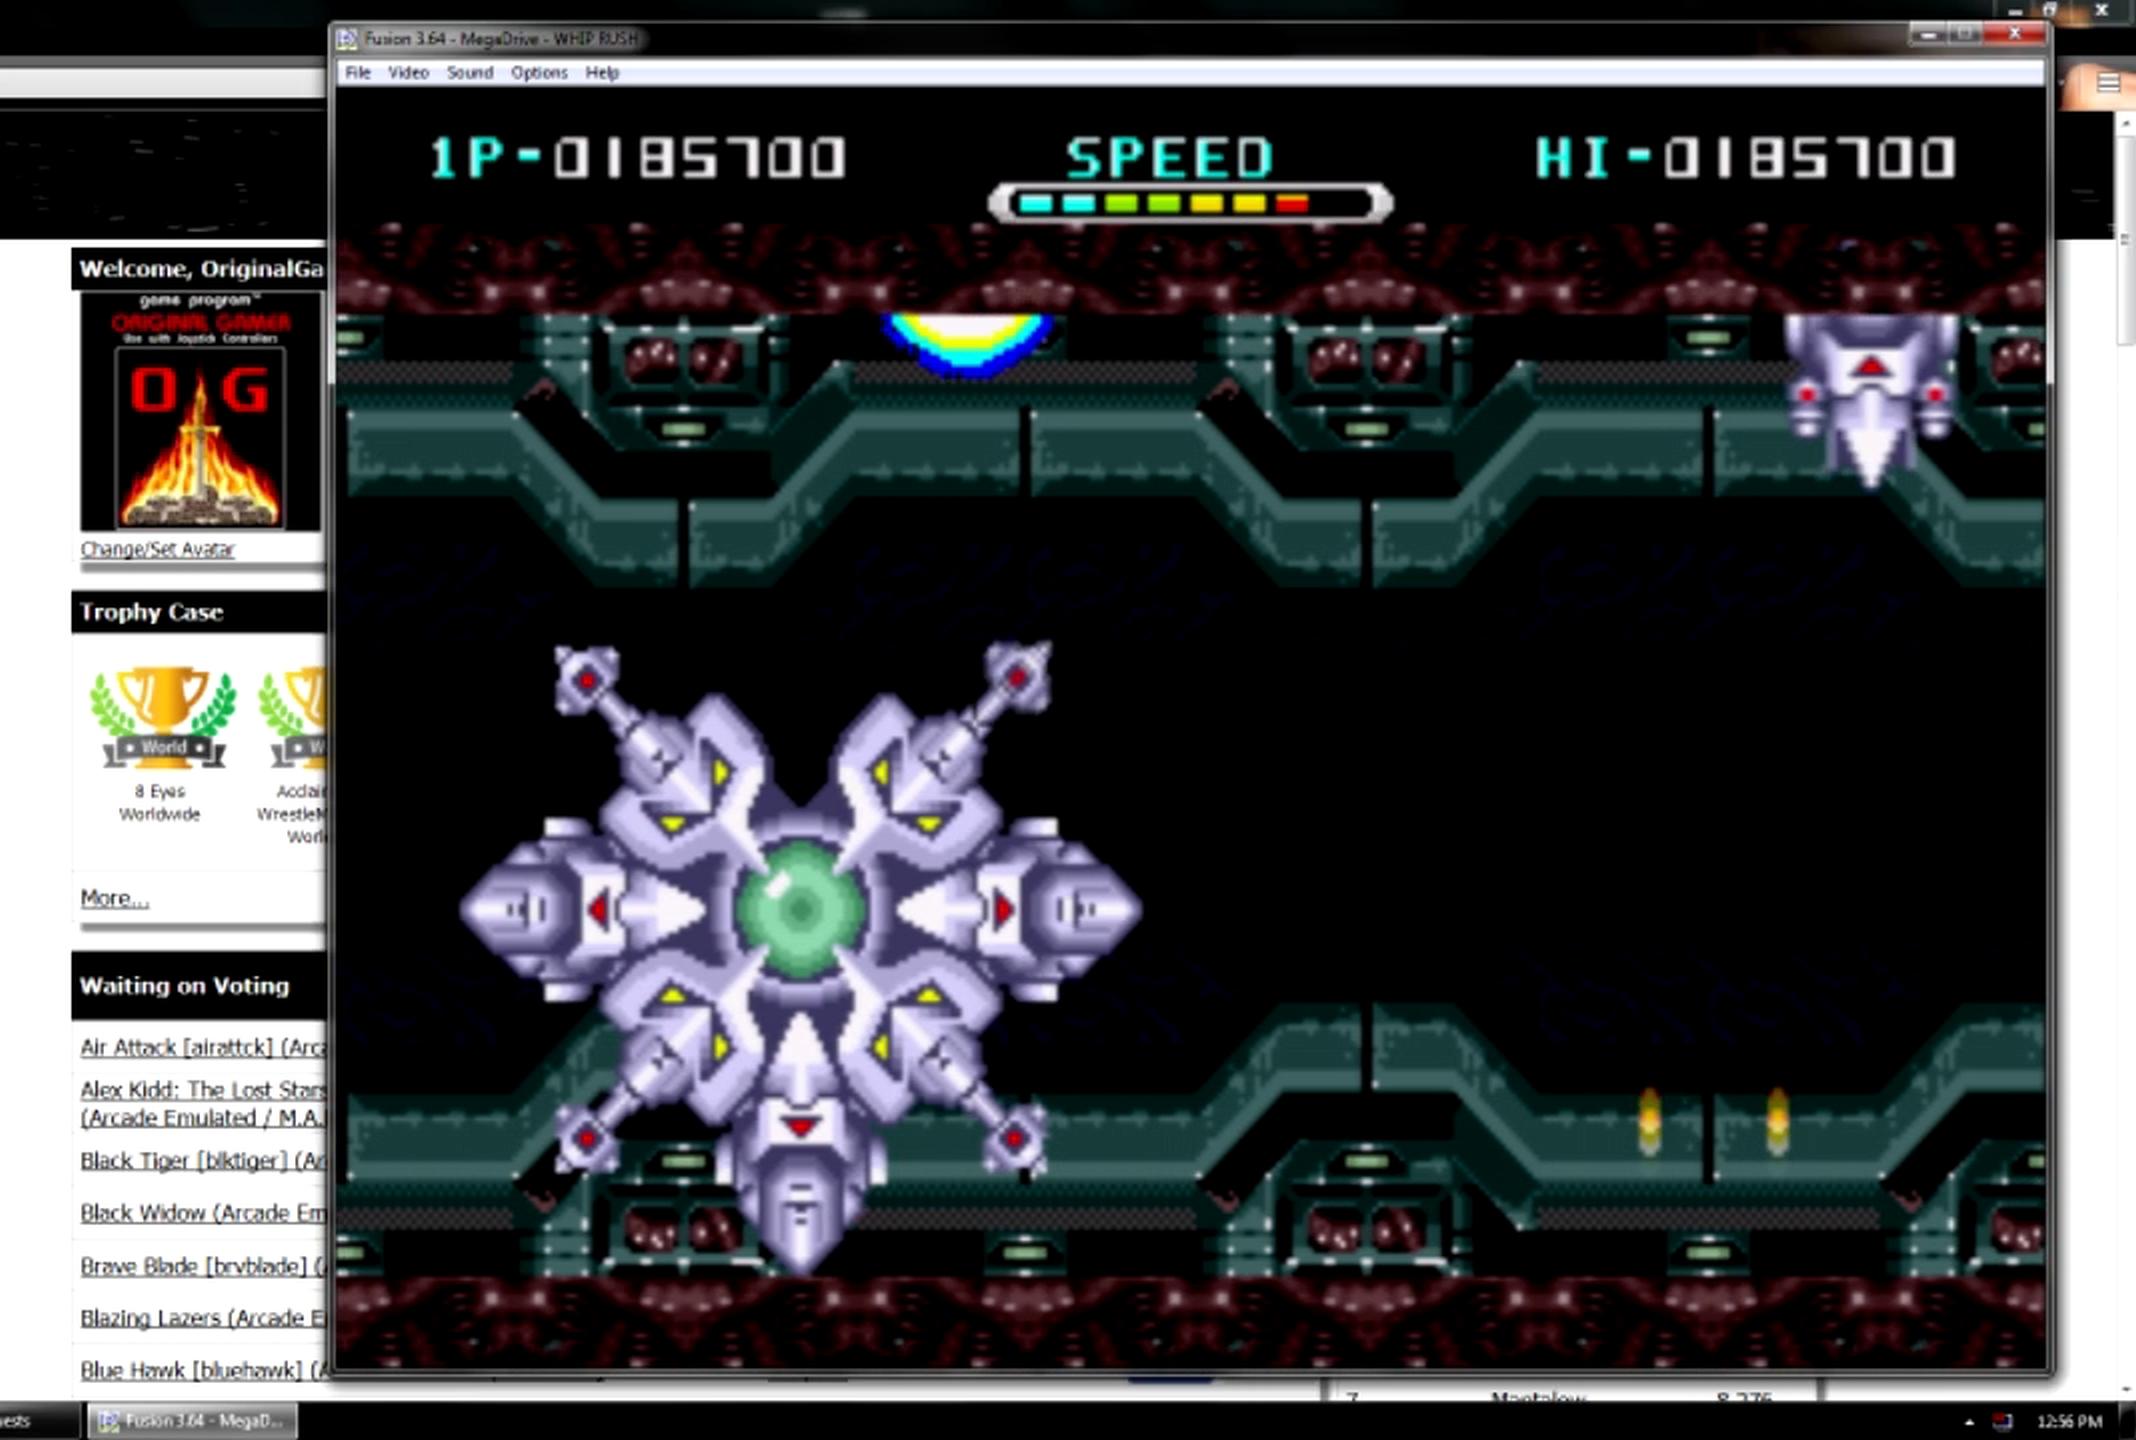 OriginalGamer: Whip Rush: Wakusei Voltegas no Nazo [Easy] (Sega Genesis / MegaDrive Emulated) 185,700 points on 2015-06-20 19:03:55